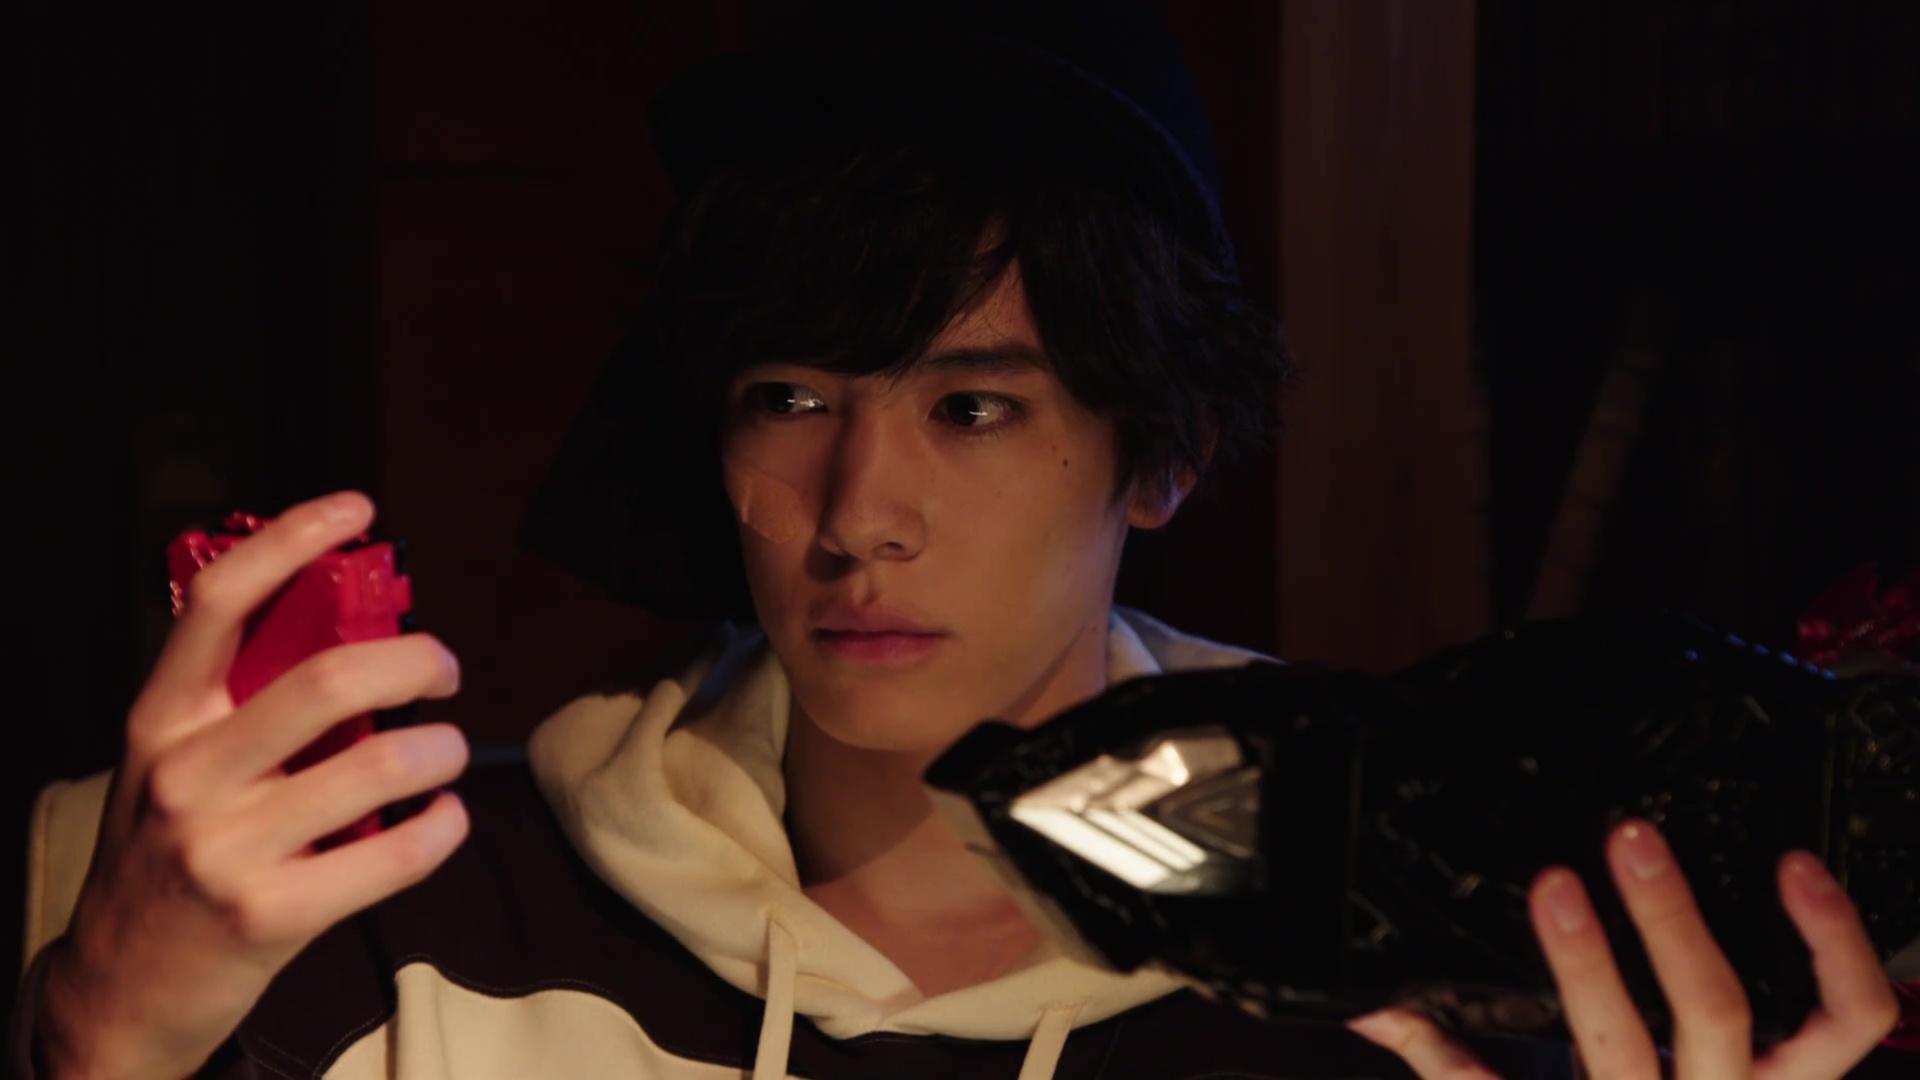 Kamen Rider Saber Episode 2 Recap